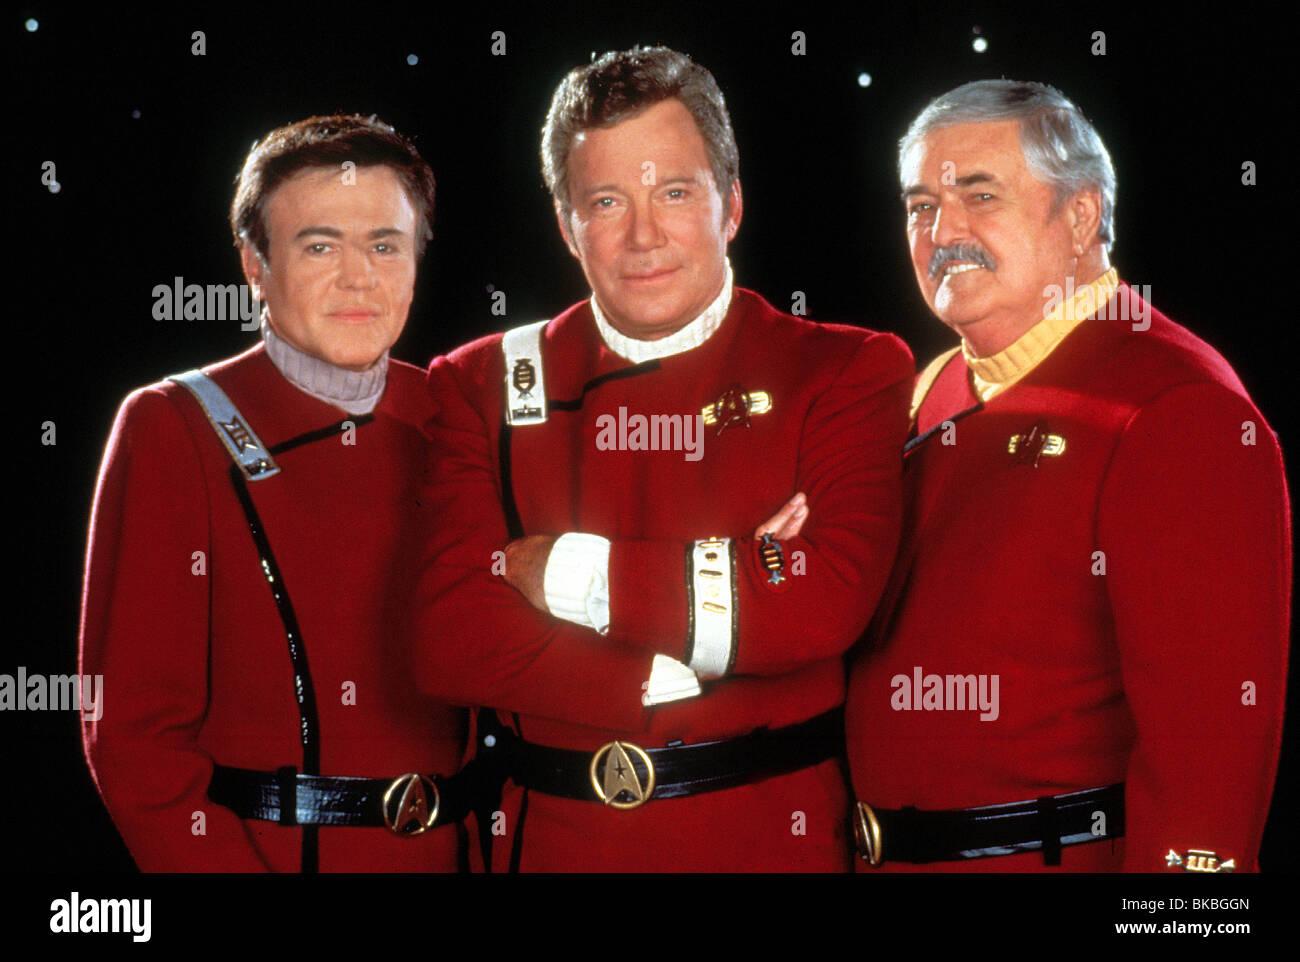 STAR TREK: GENERATIONS (1994) WALTER KOENIG, WILLIAM SHATNER, JAMES DOOHAN STGN 073 - Stock Image